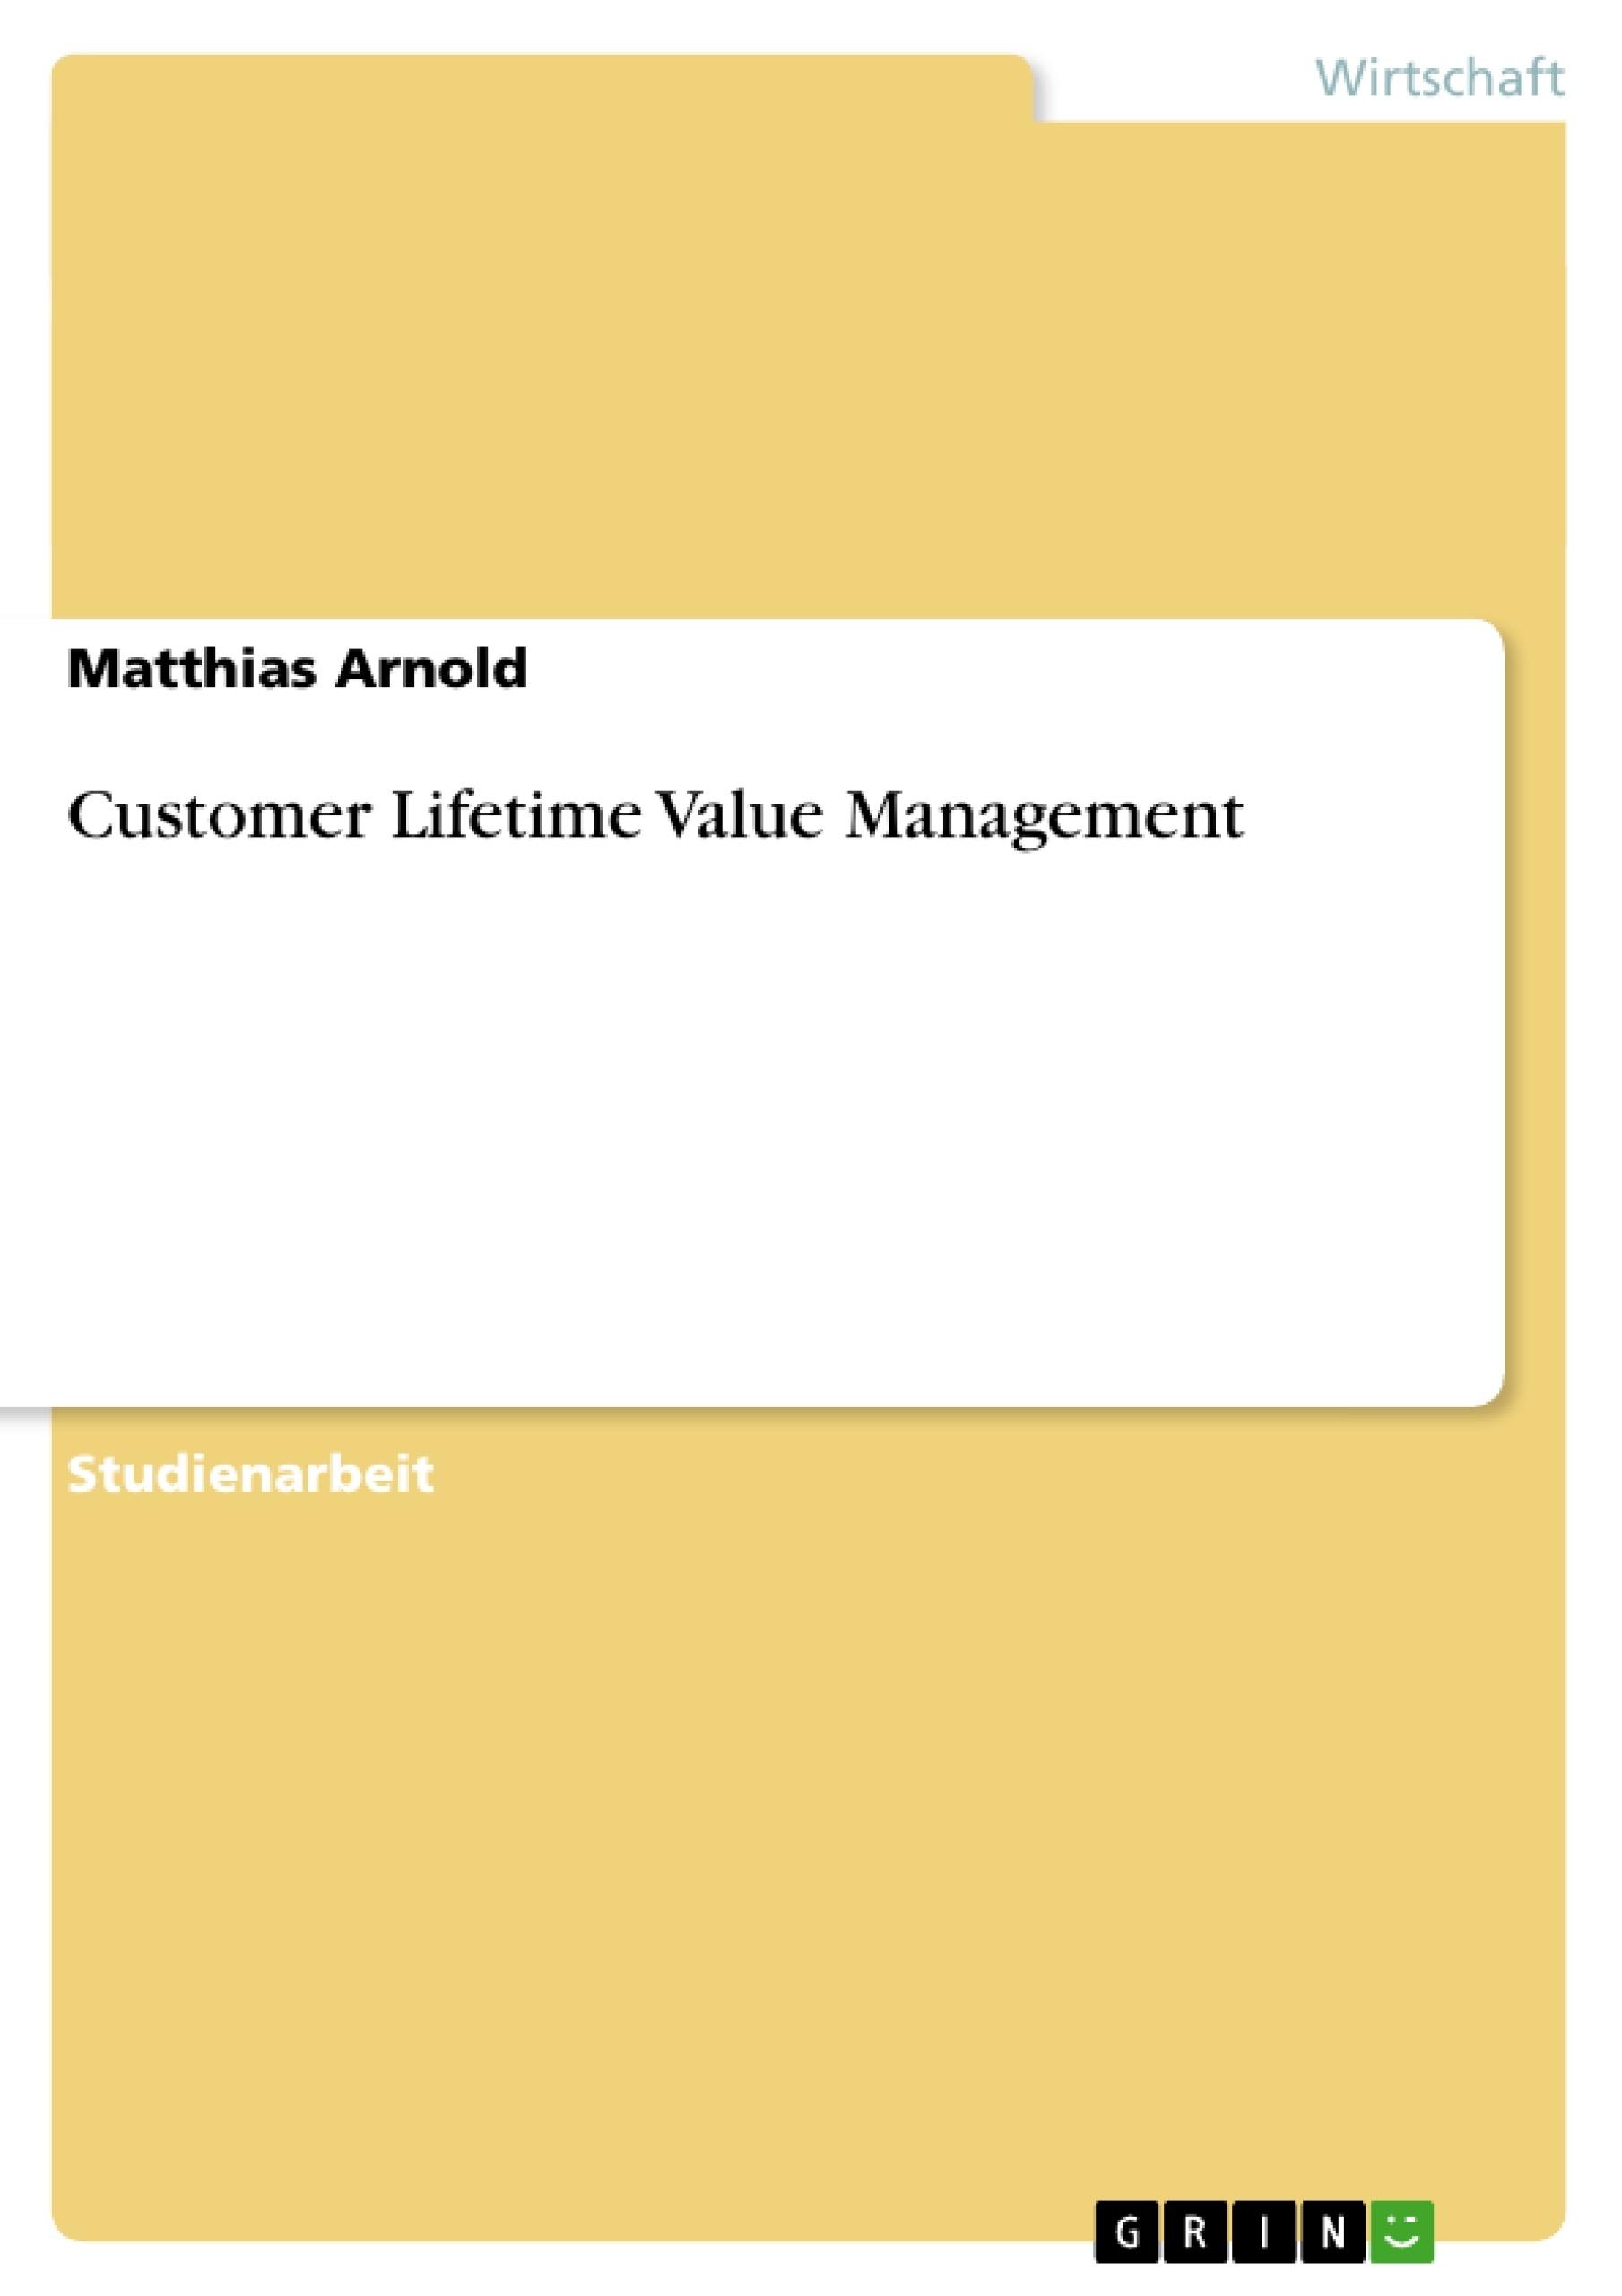 Titel: Customer Lifetime Value Management